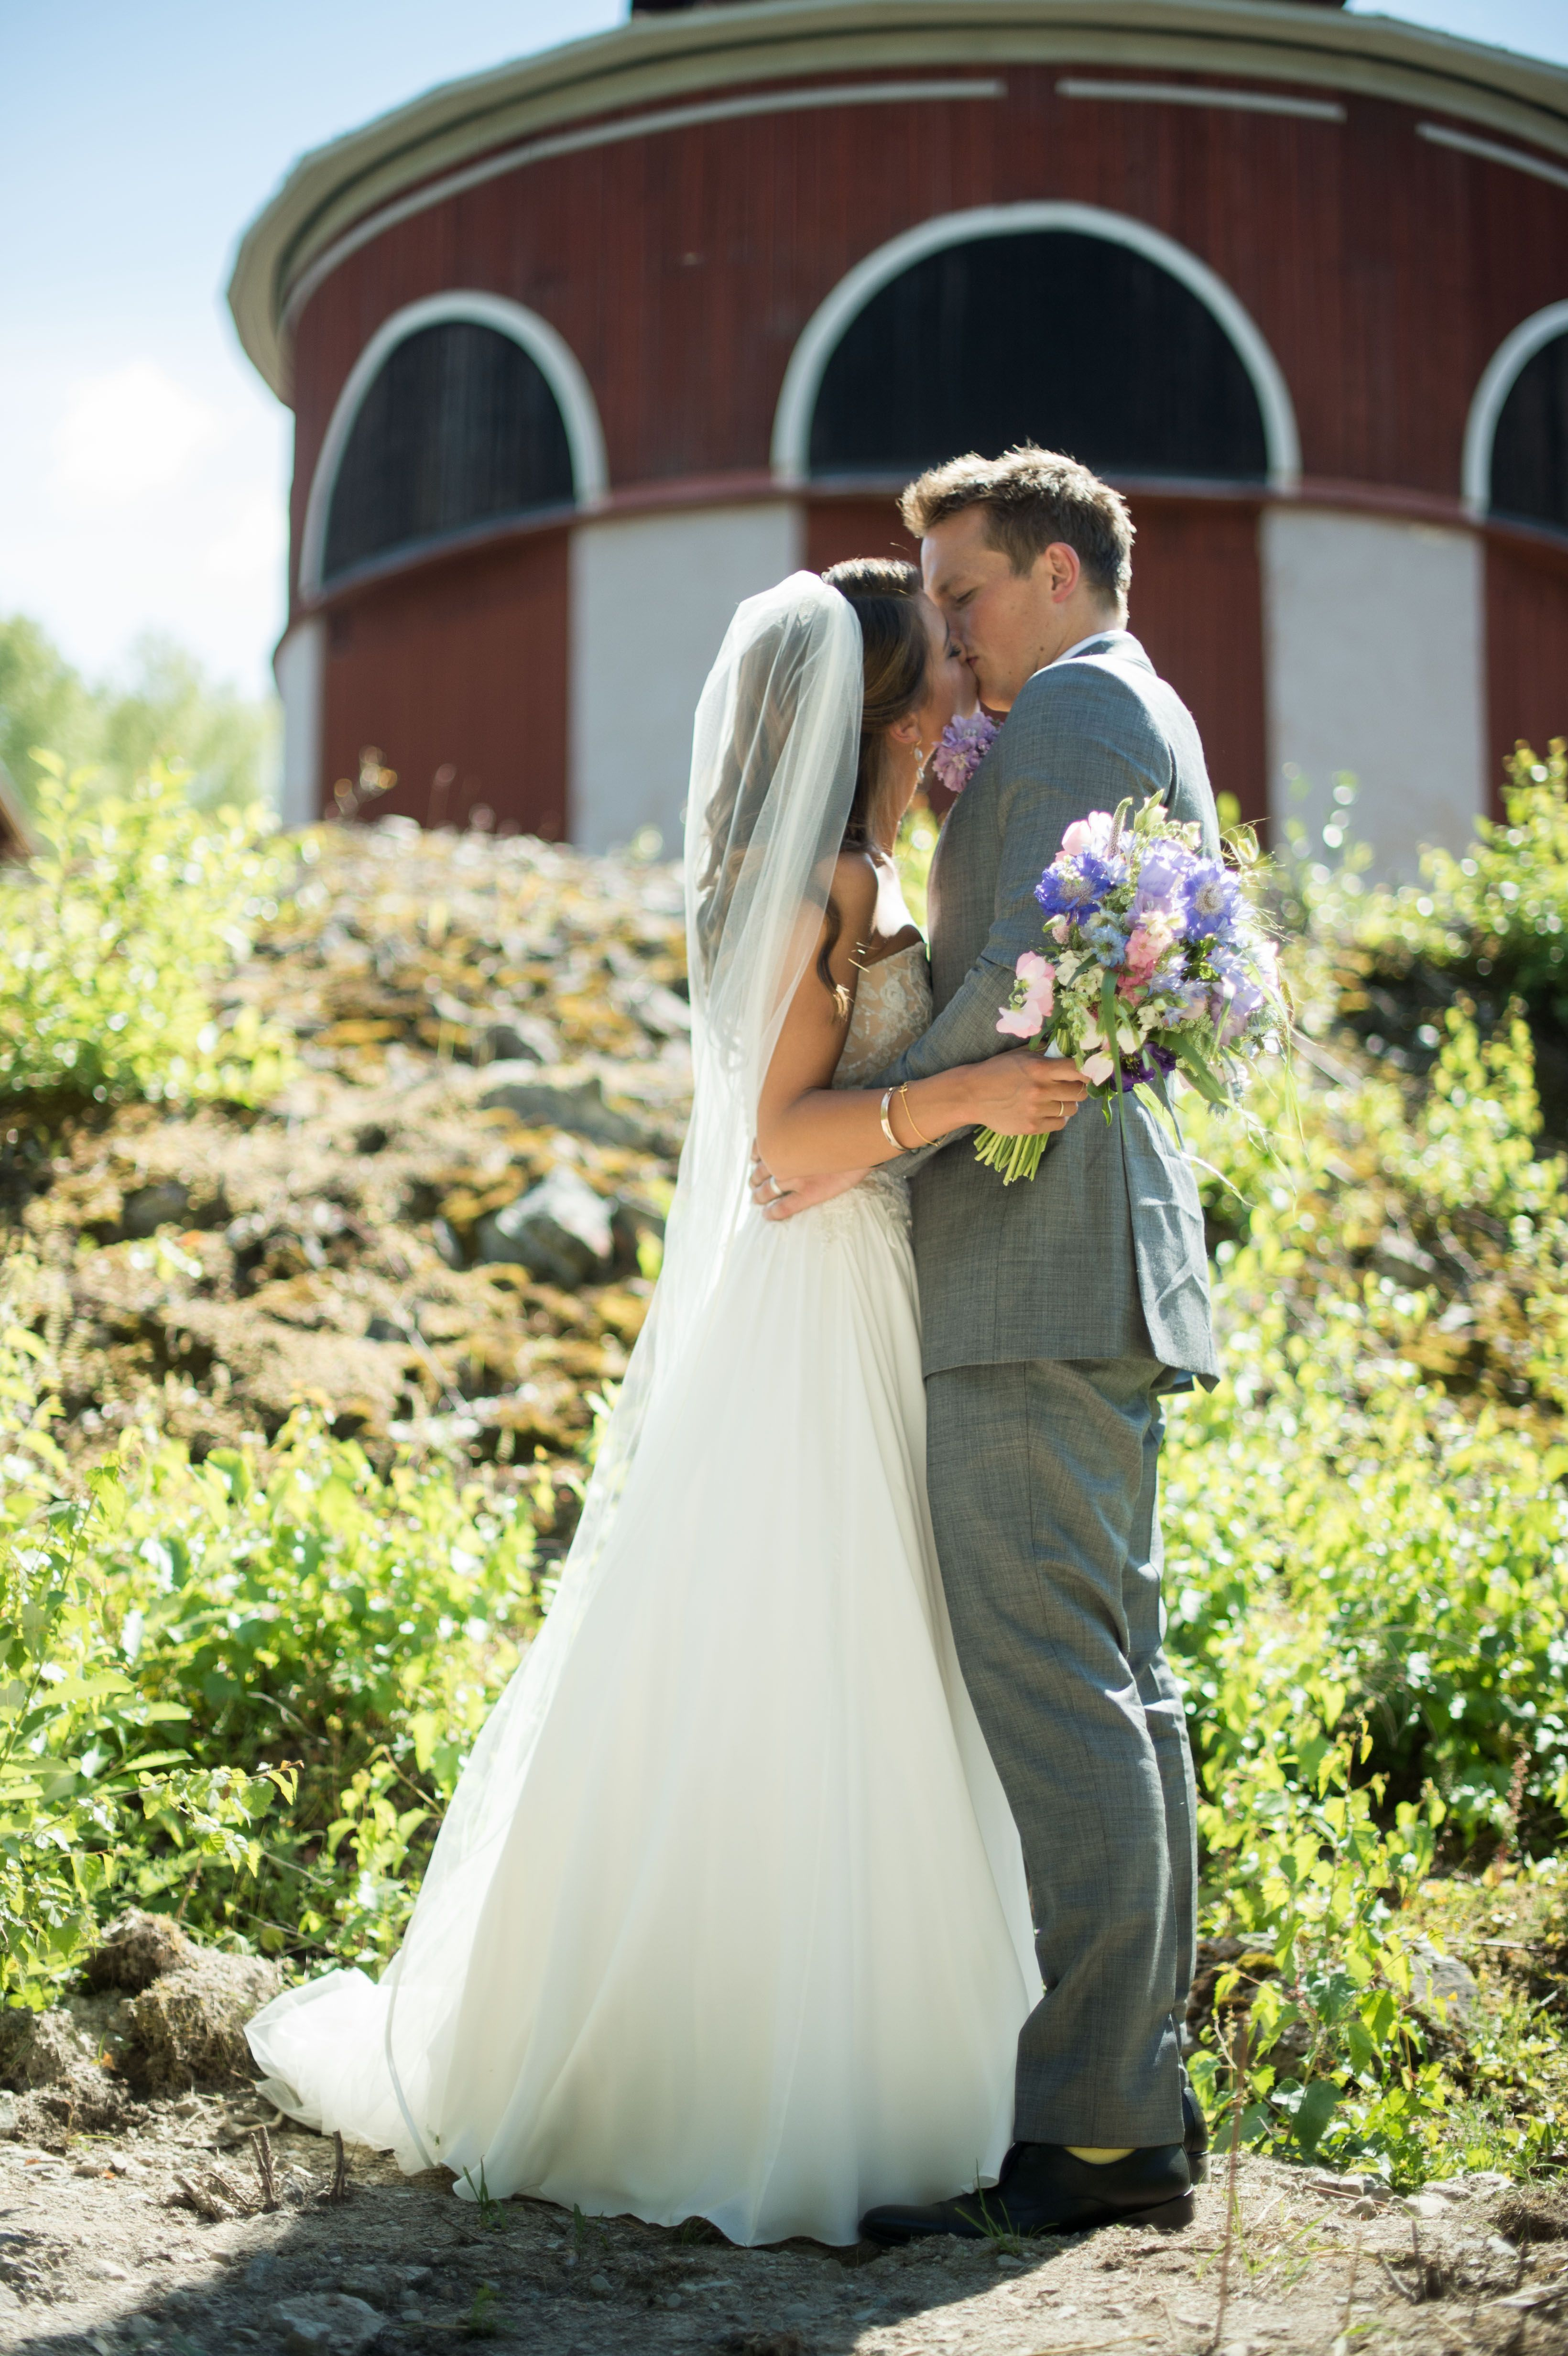 Sala Silvergruva, Sala Silvergruva brollop, Swedish wedding, Sala wedding, Sala Silvermine wedding